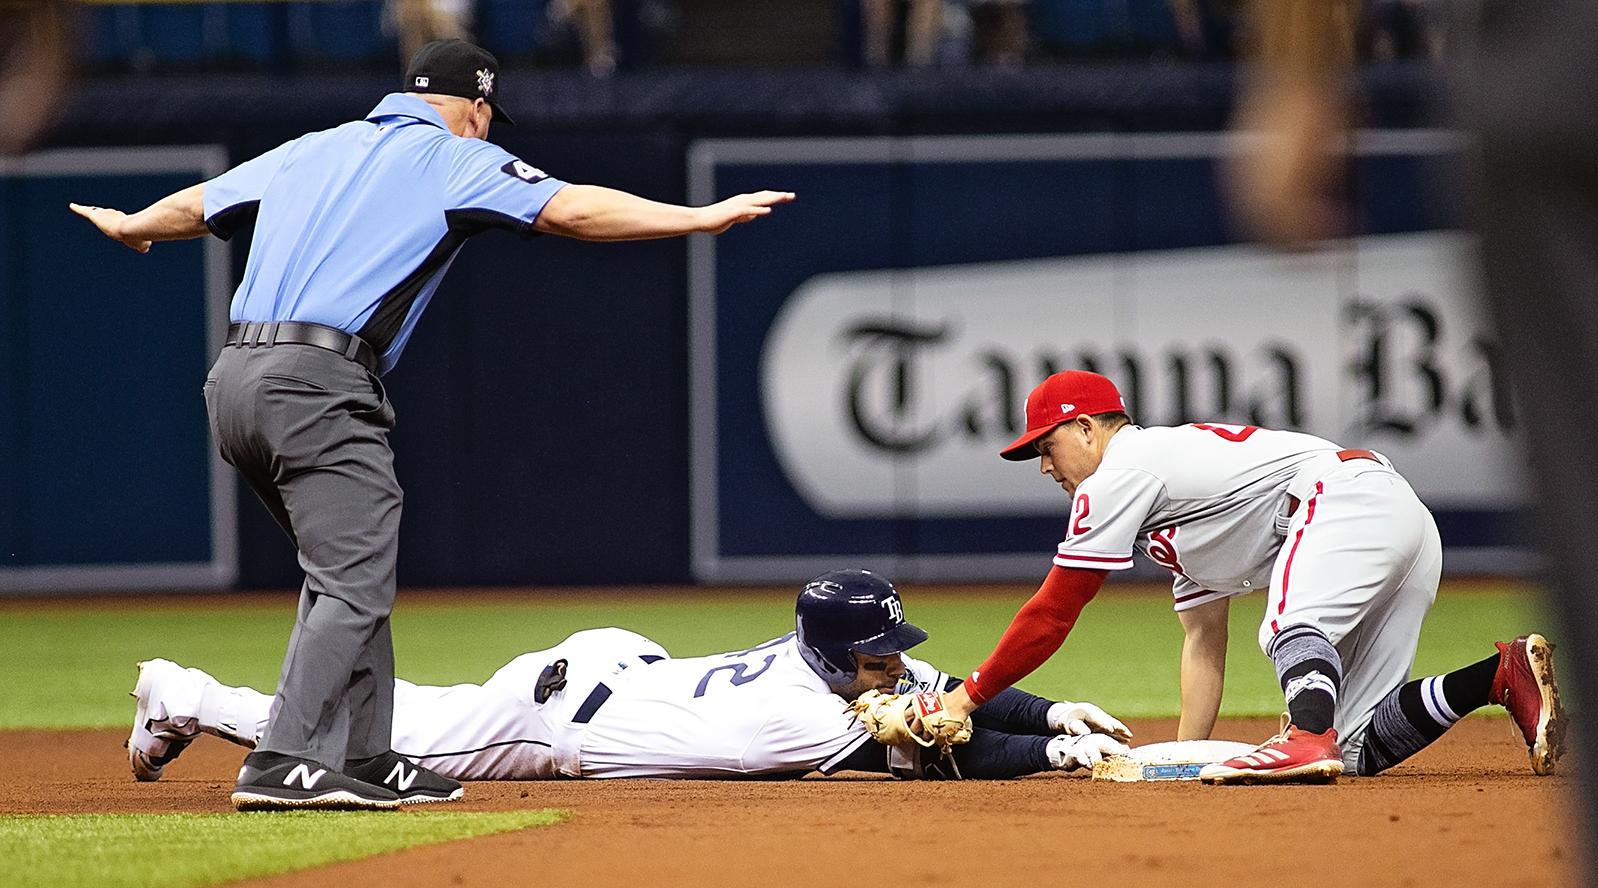 Kiermaier injured his thumb as he took second base./CARMEN MANDATO